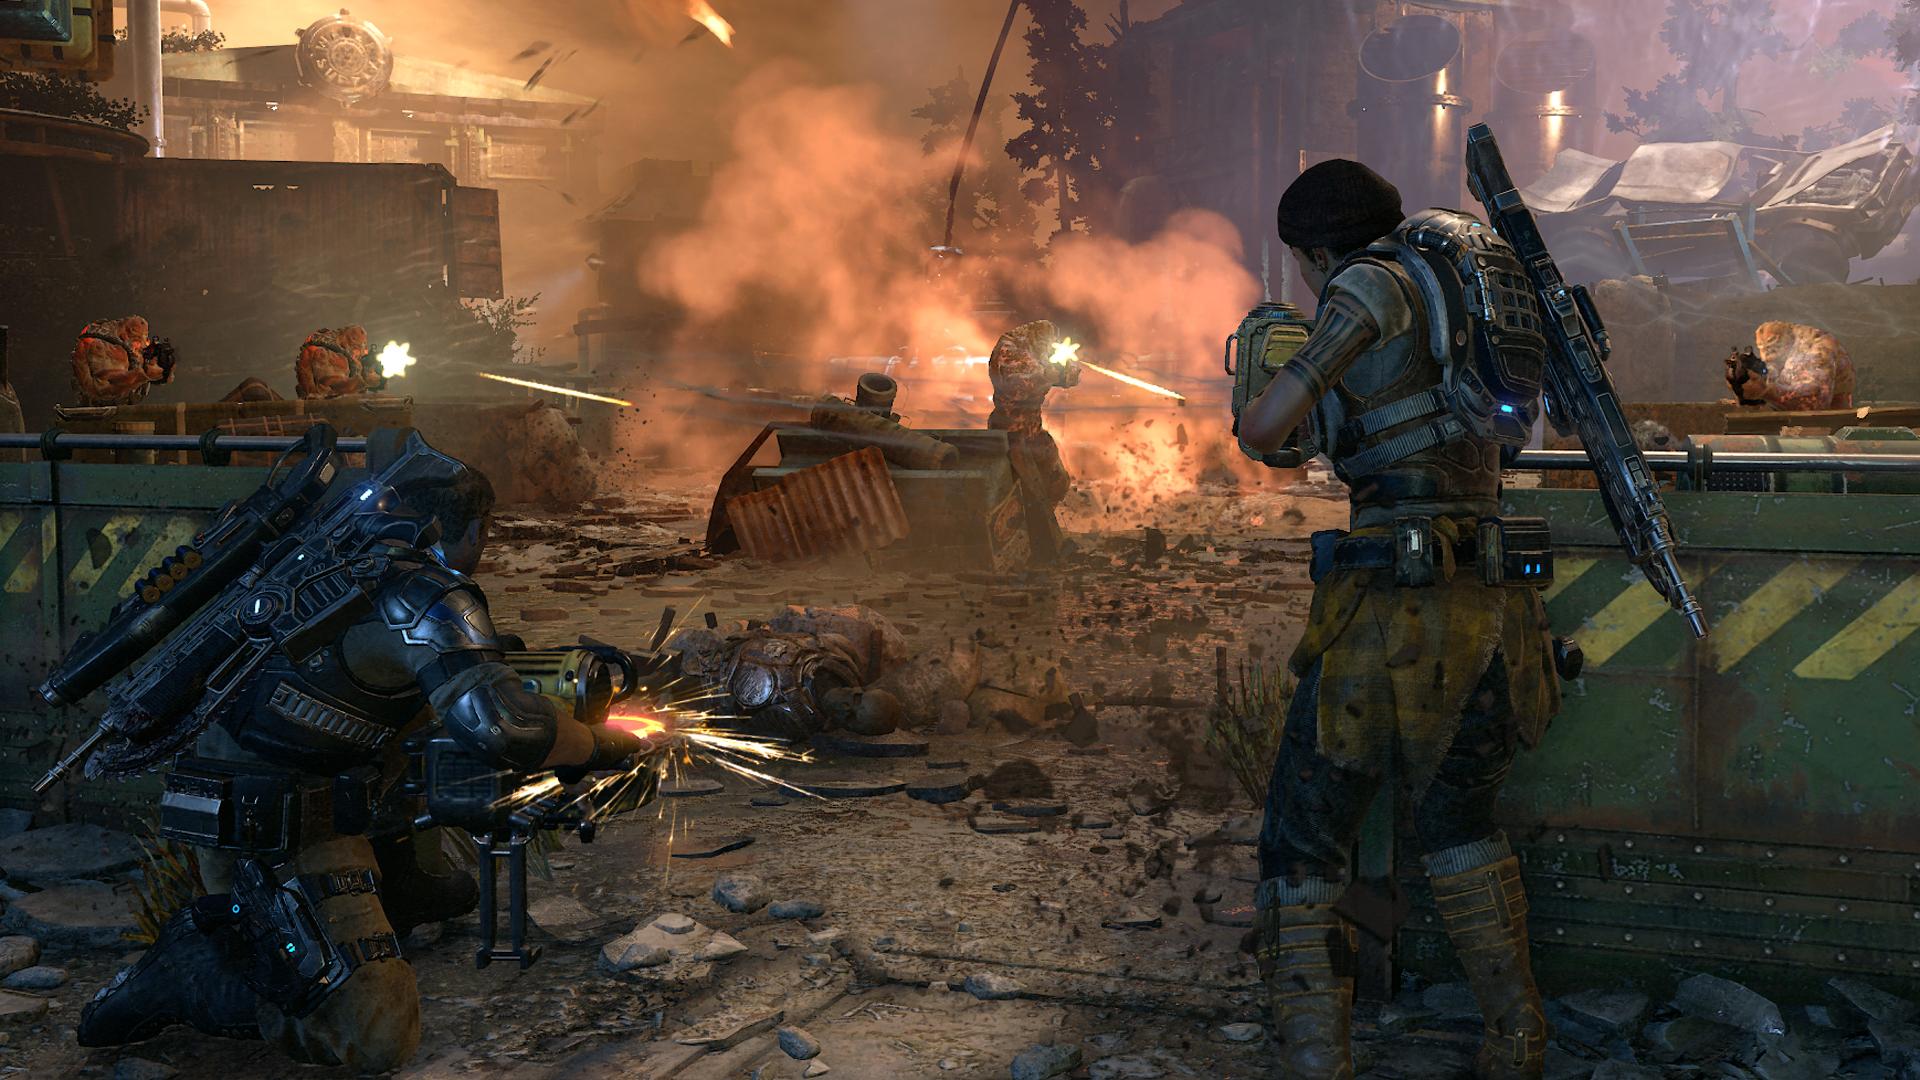 Gears of War 4 Achievements List